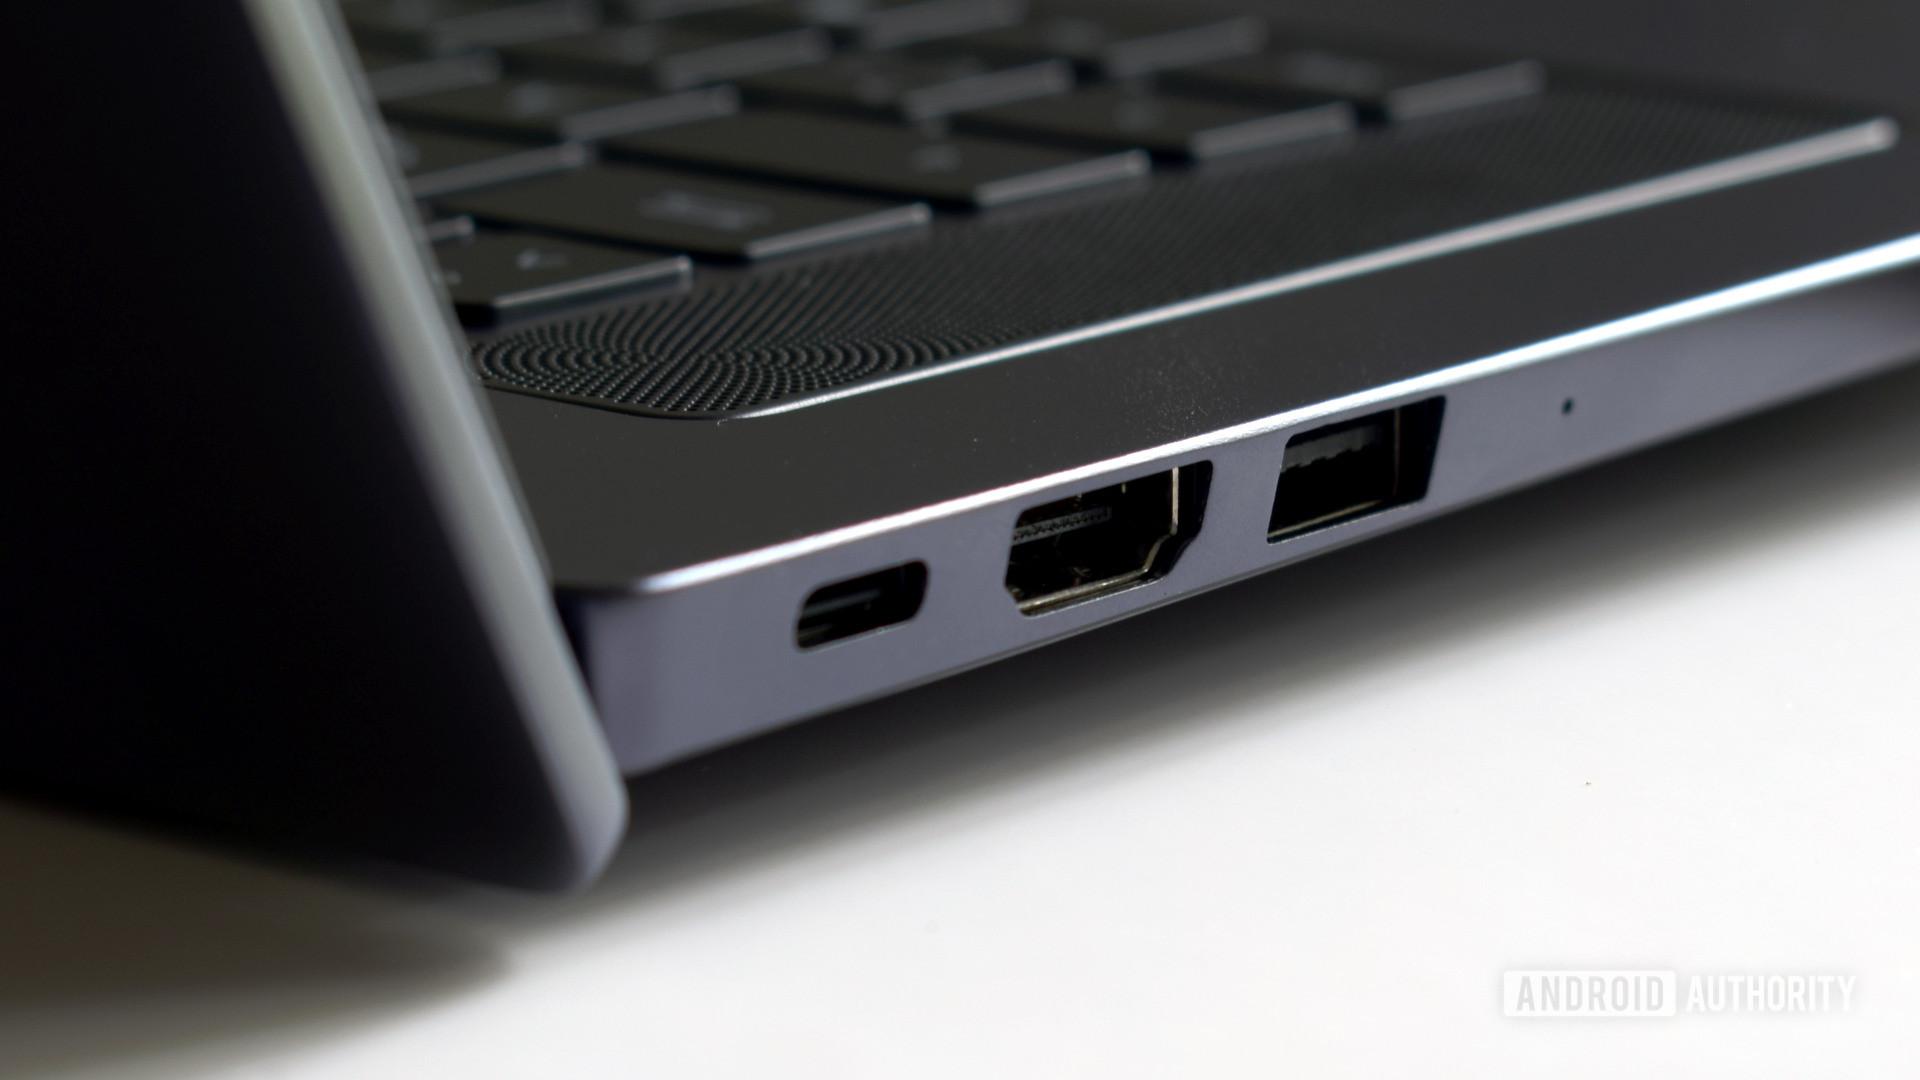 Honor MagicBook Pro USB C